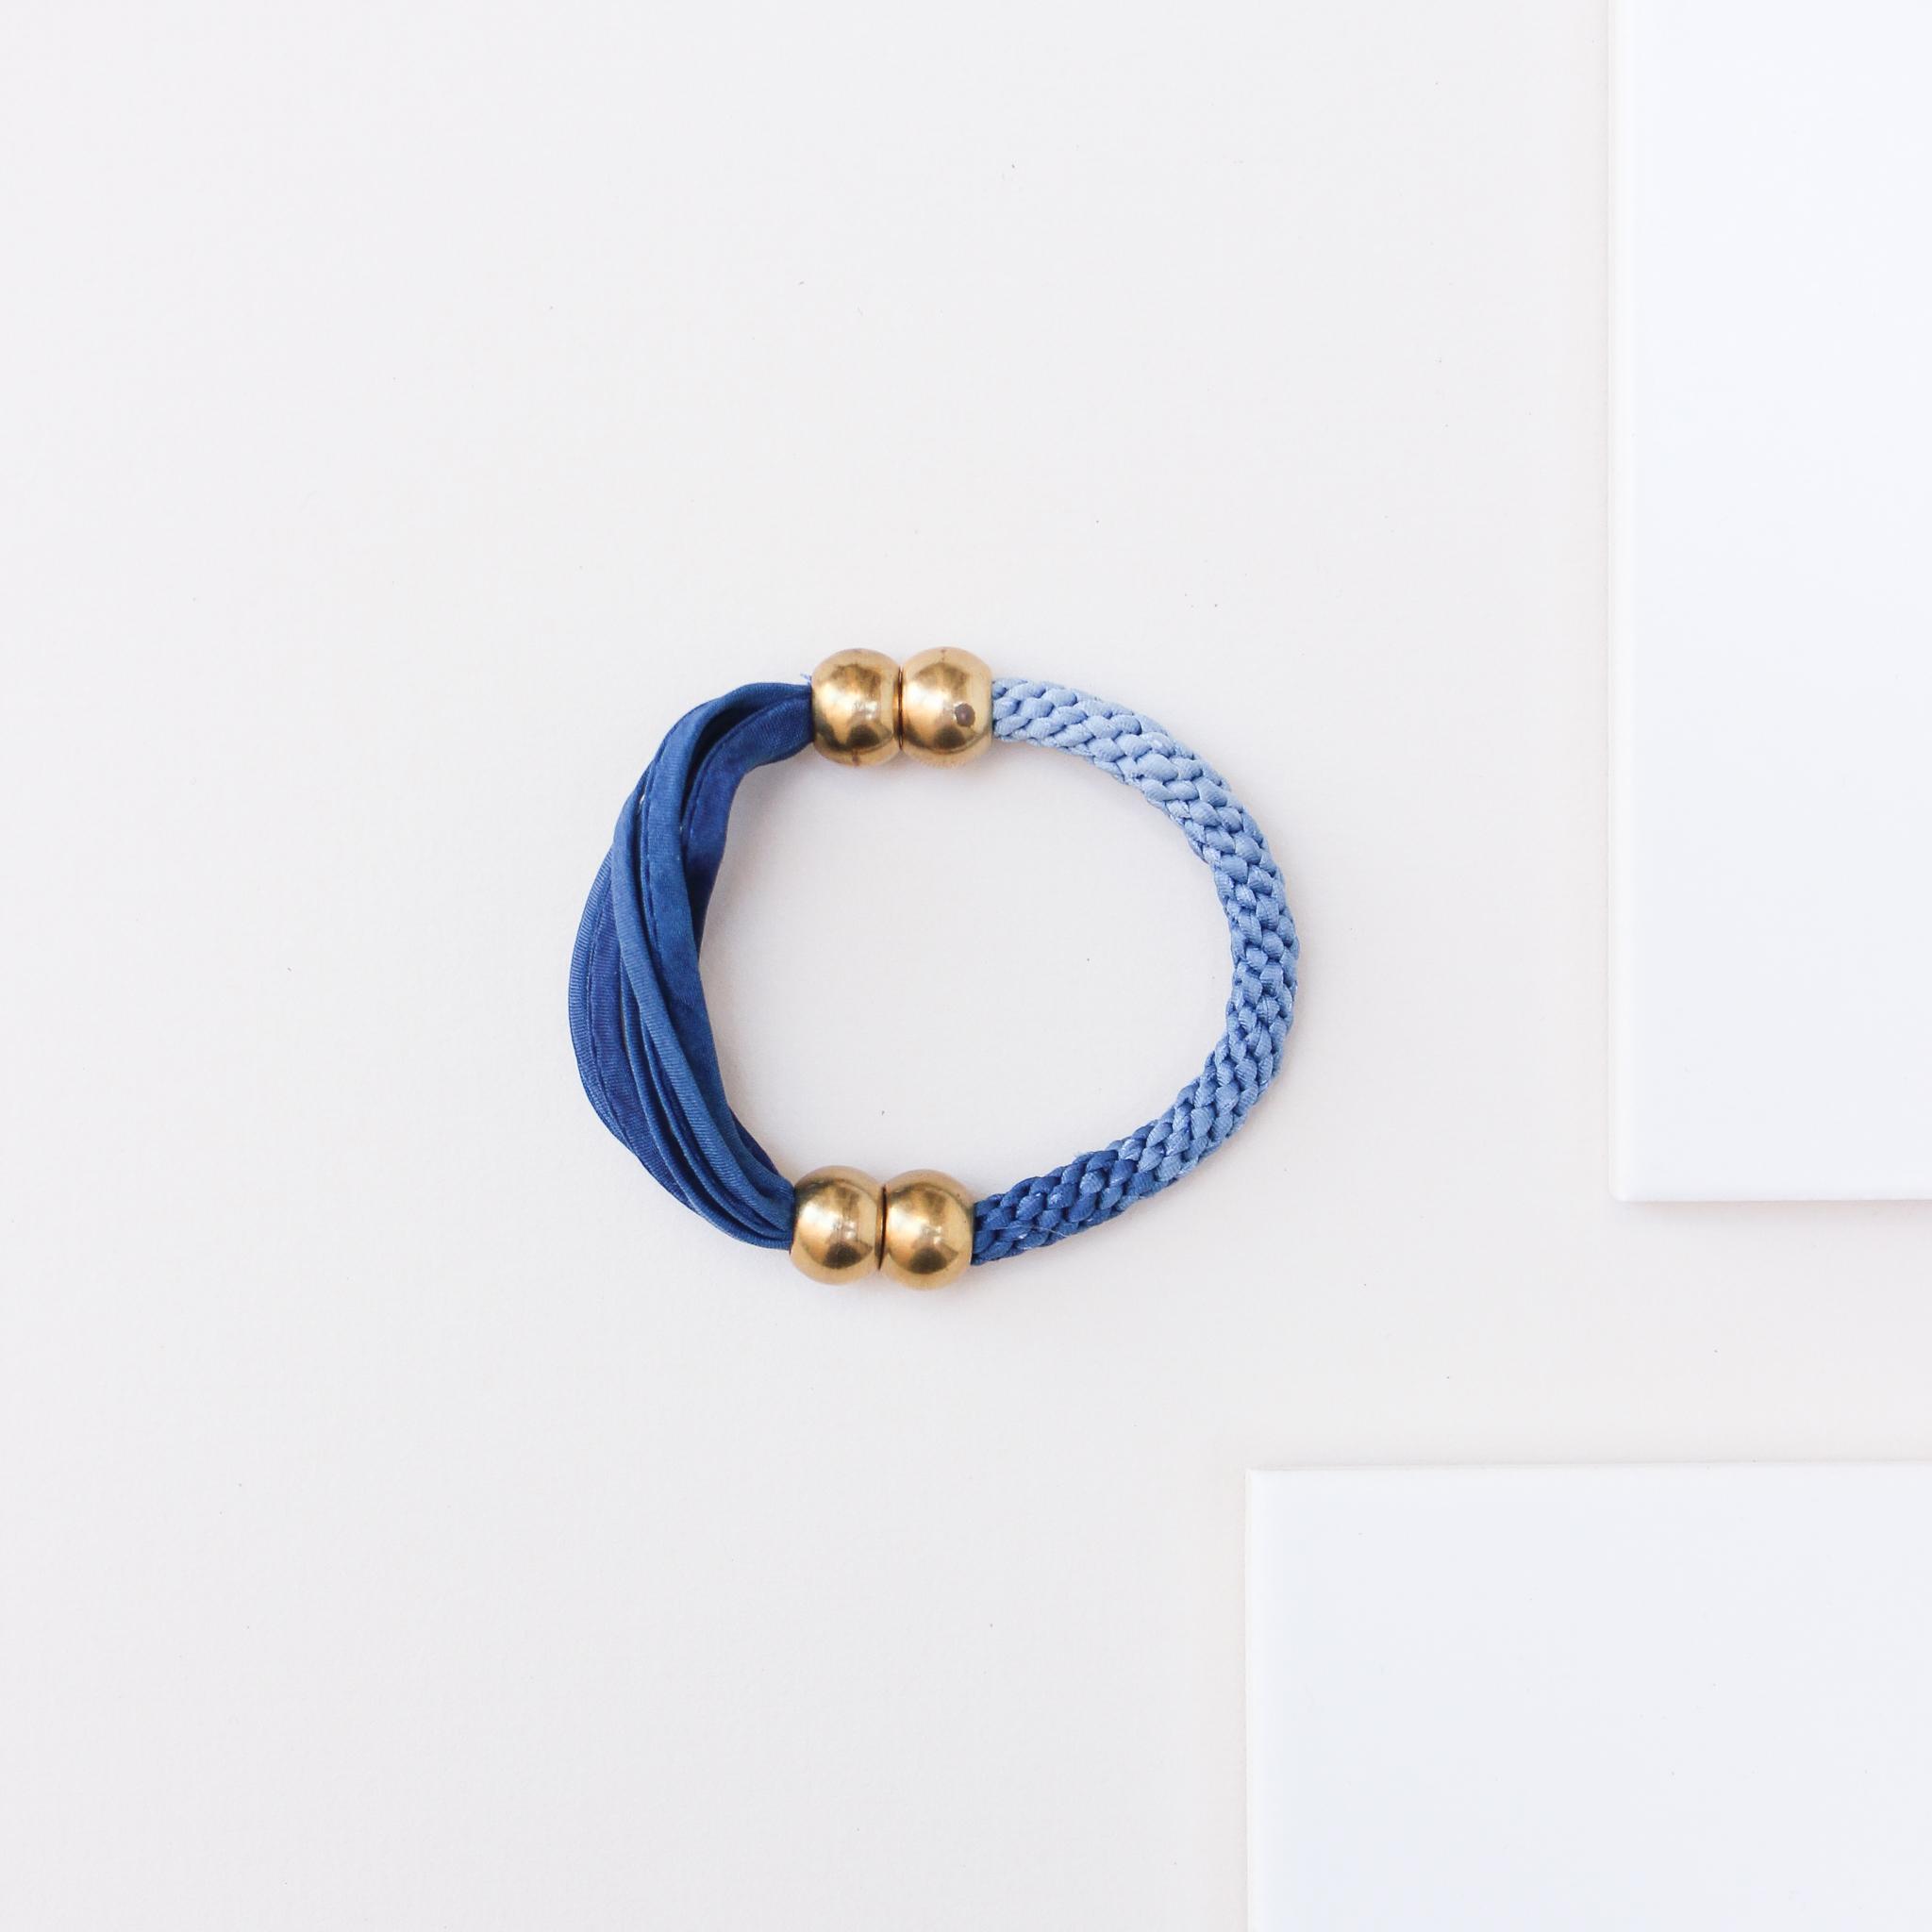 3_New Perilune Bracelet.jpg